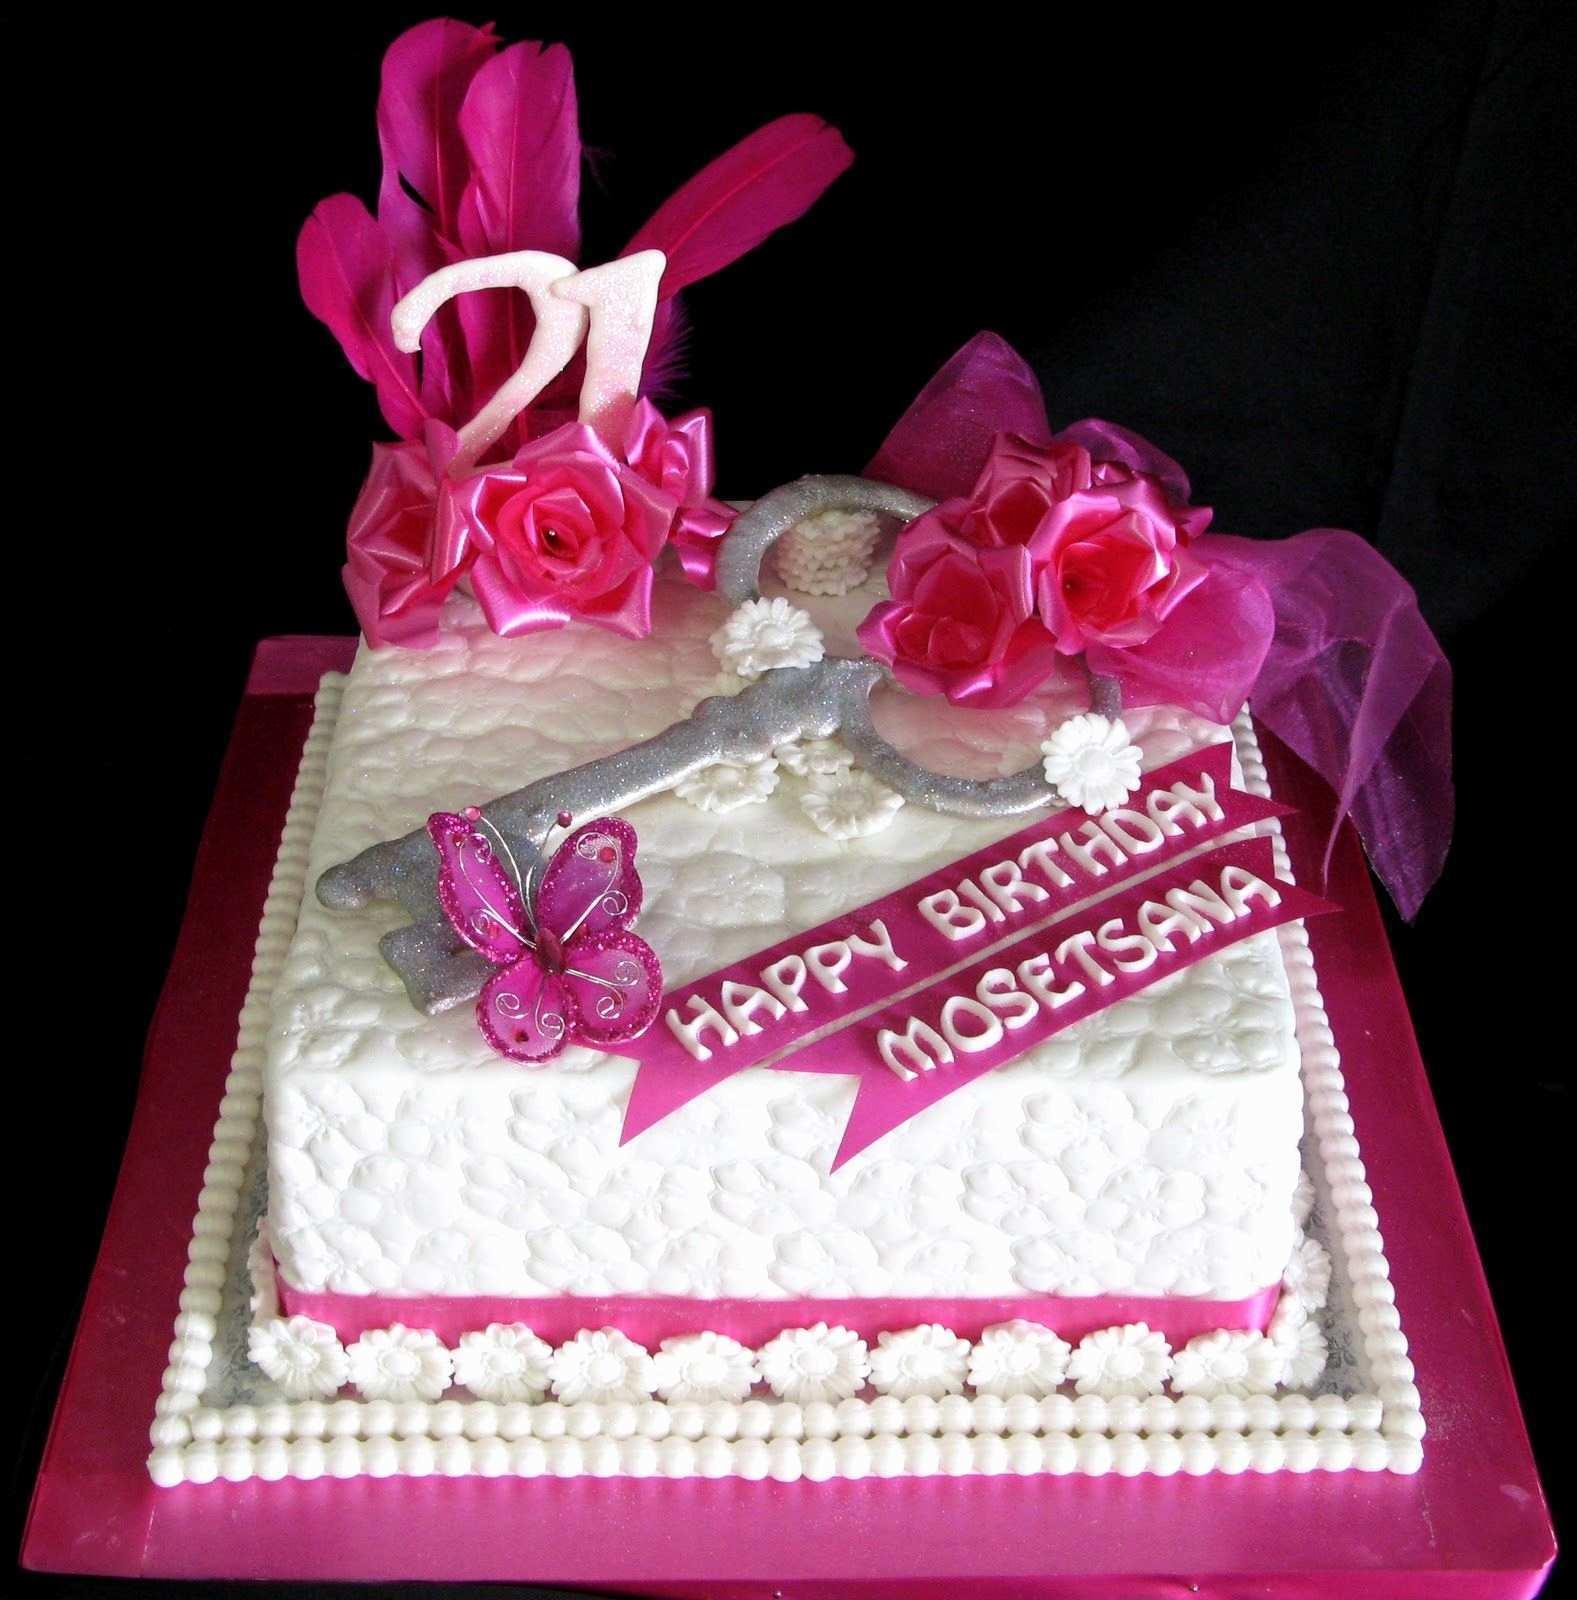 Terrific Anu Name Wallpaper Most Beautiful Birthday Cake 683737 Hd Funny Birthday Cards Online Barepcheapnameinfo